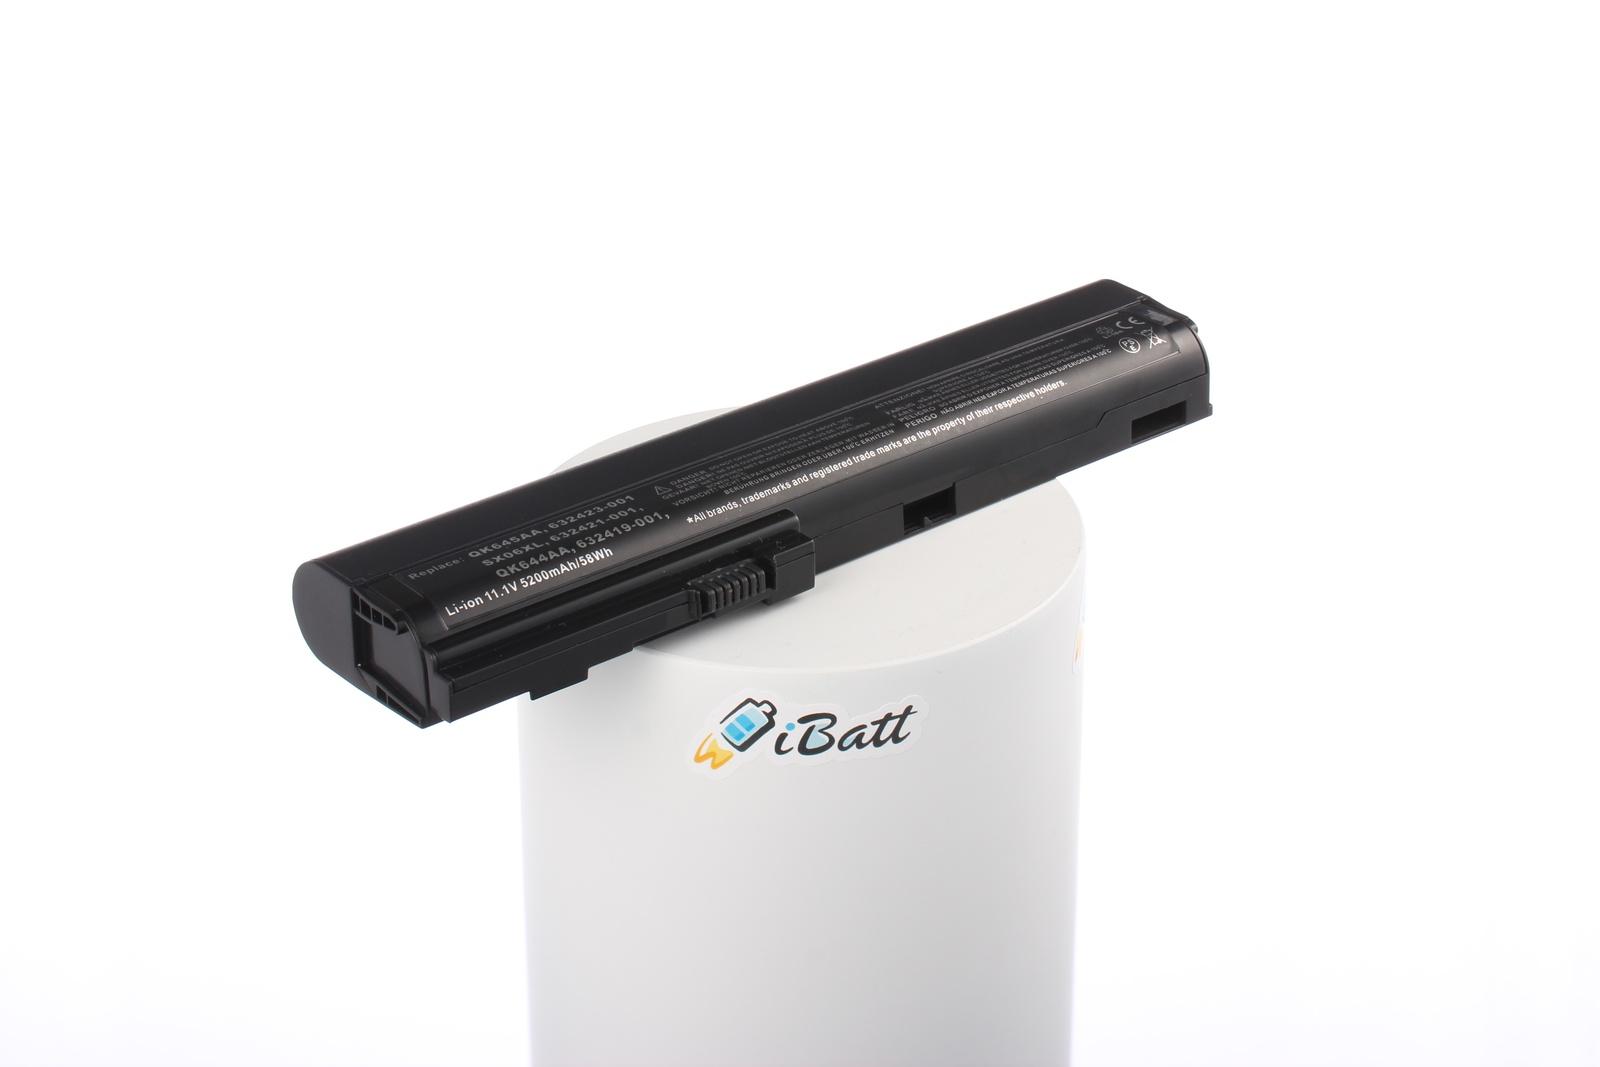 Аккумулятор для ноутбука iBatt iB-A286H, черный аккумулятор для ноутбука hp elitebook 2560p 2570p series 4400мач 11 1v topon top hp2560